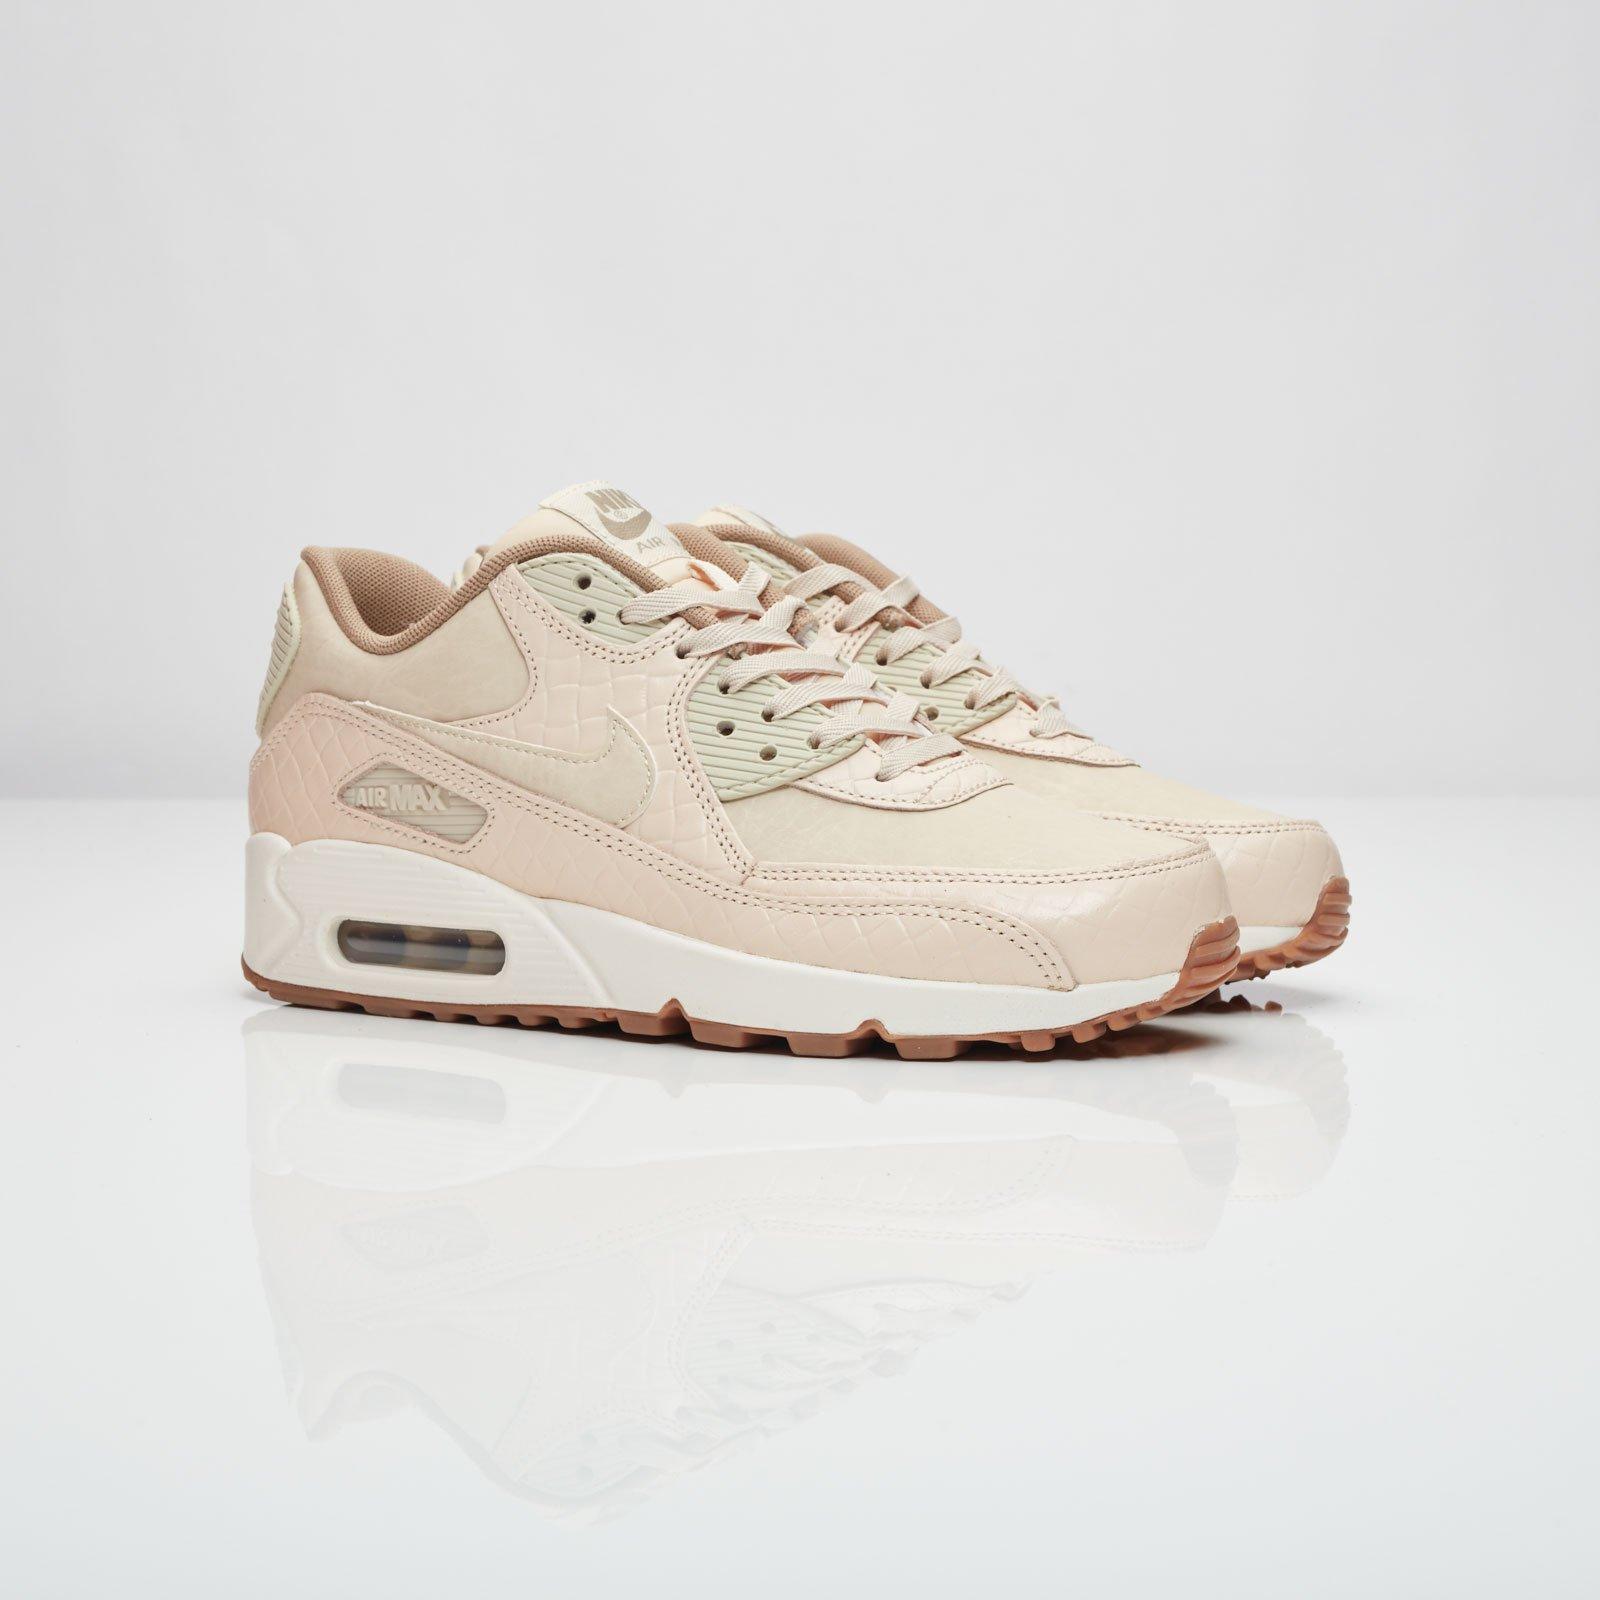 Nike Wmns Air Max 90 Premium 443817 105 Sneakersnstuff